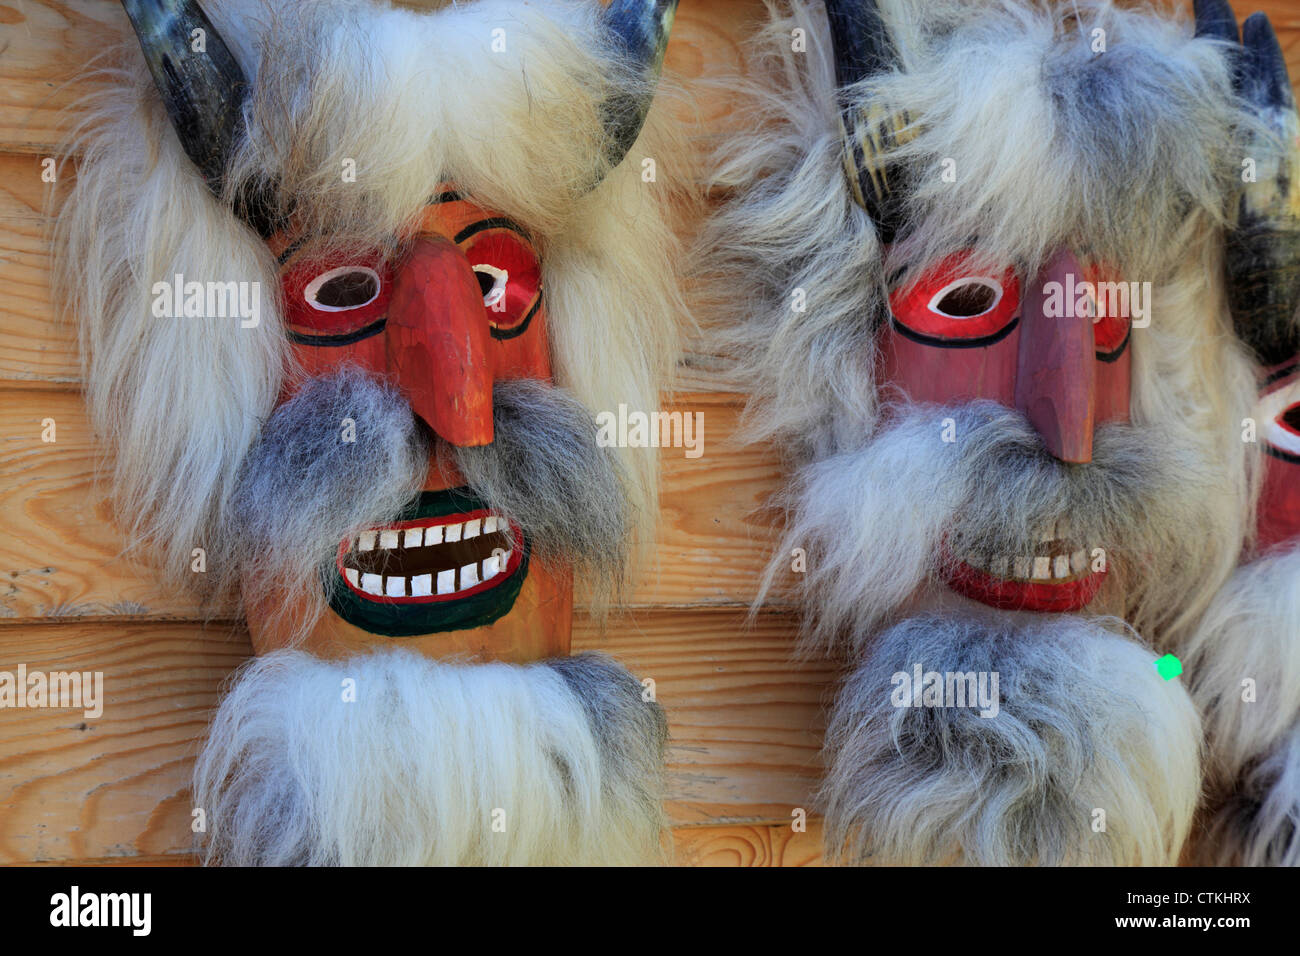 Colorful traditional ritual masks in a gift shop in Bran, Transylvania, Romania - Stock Image